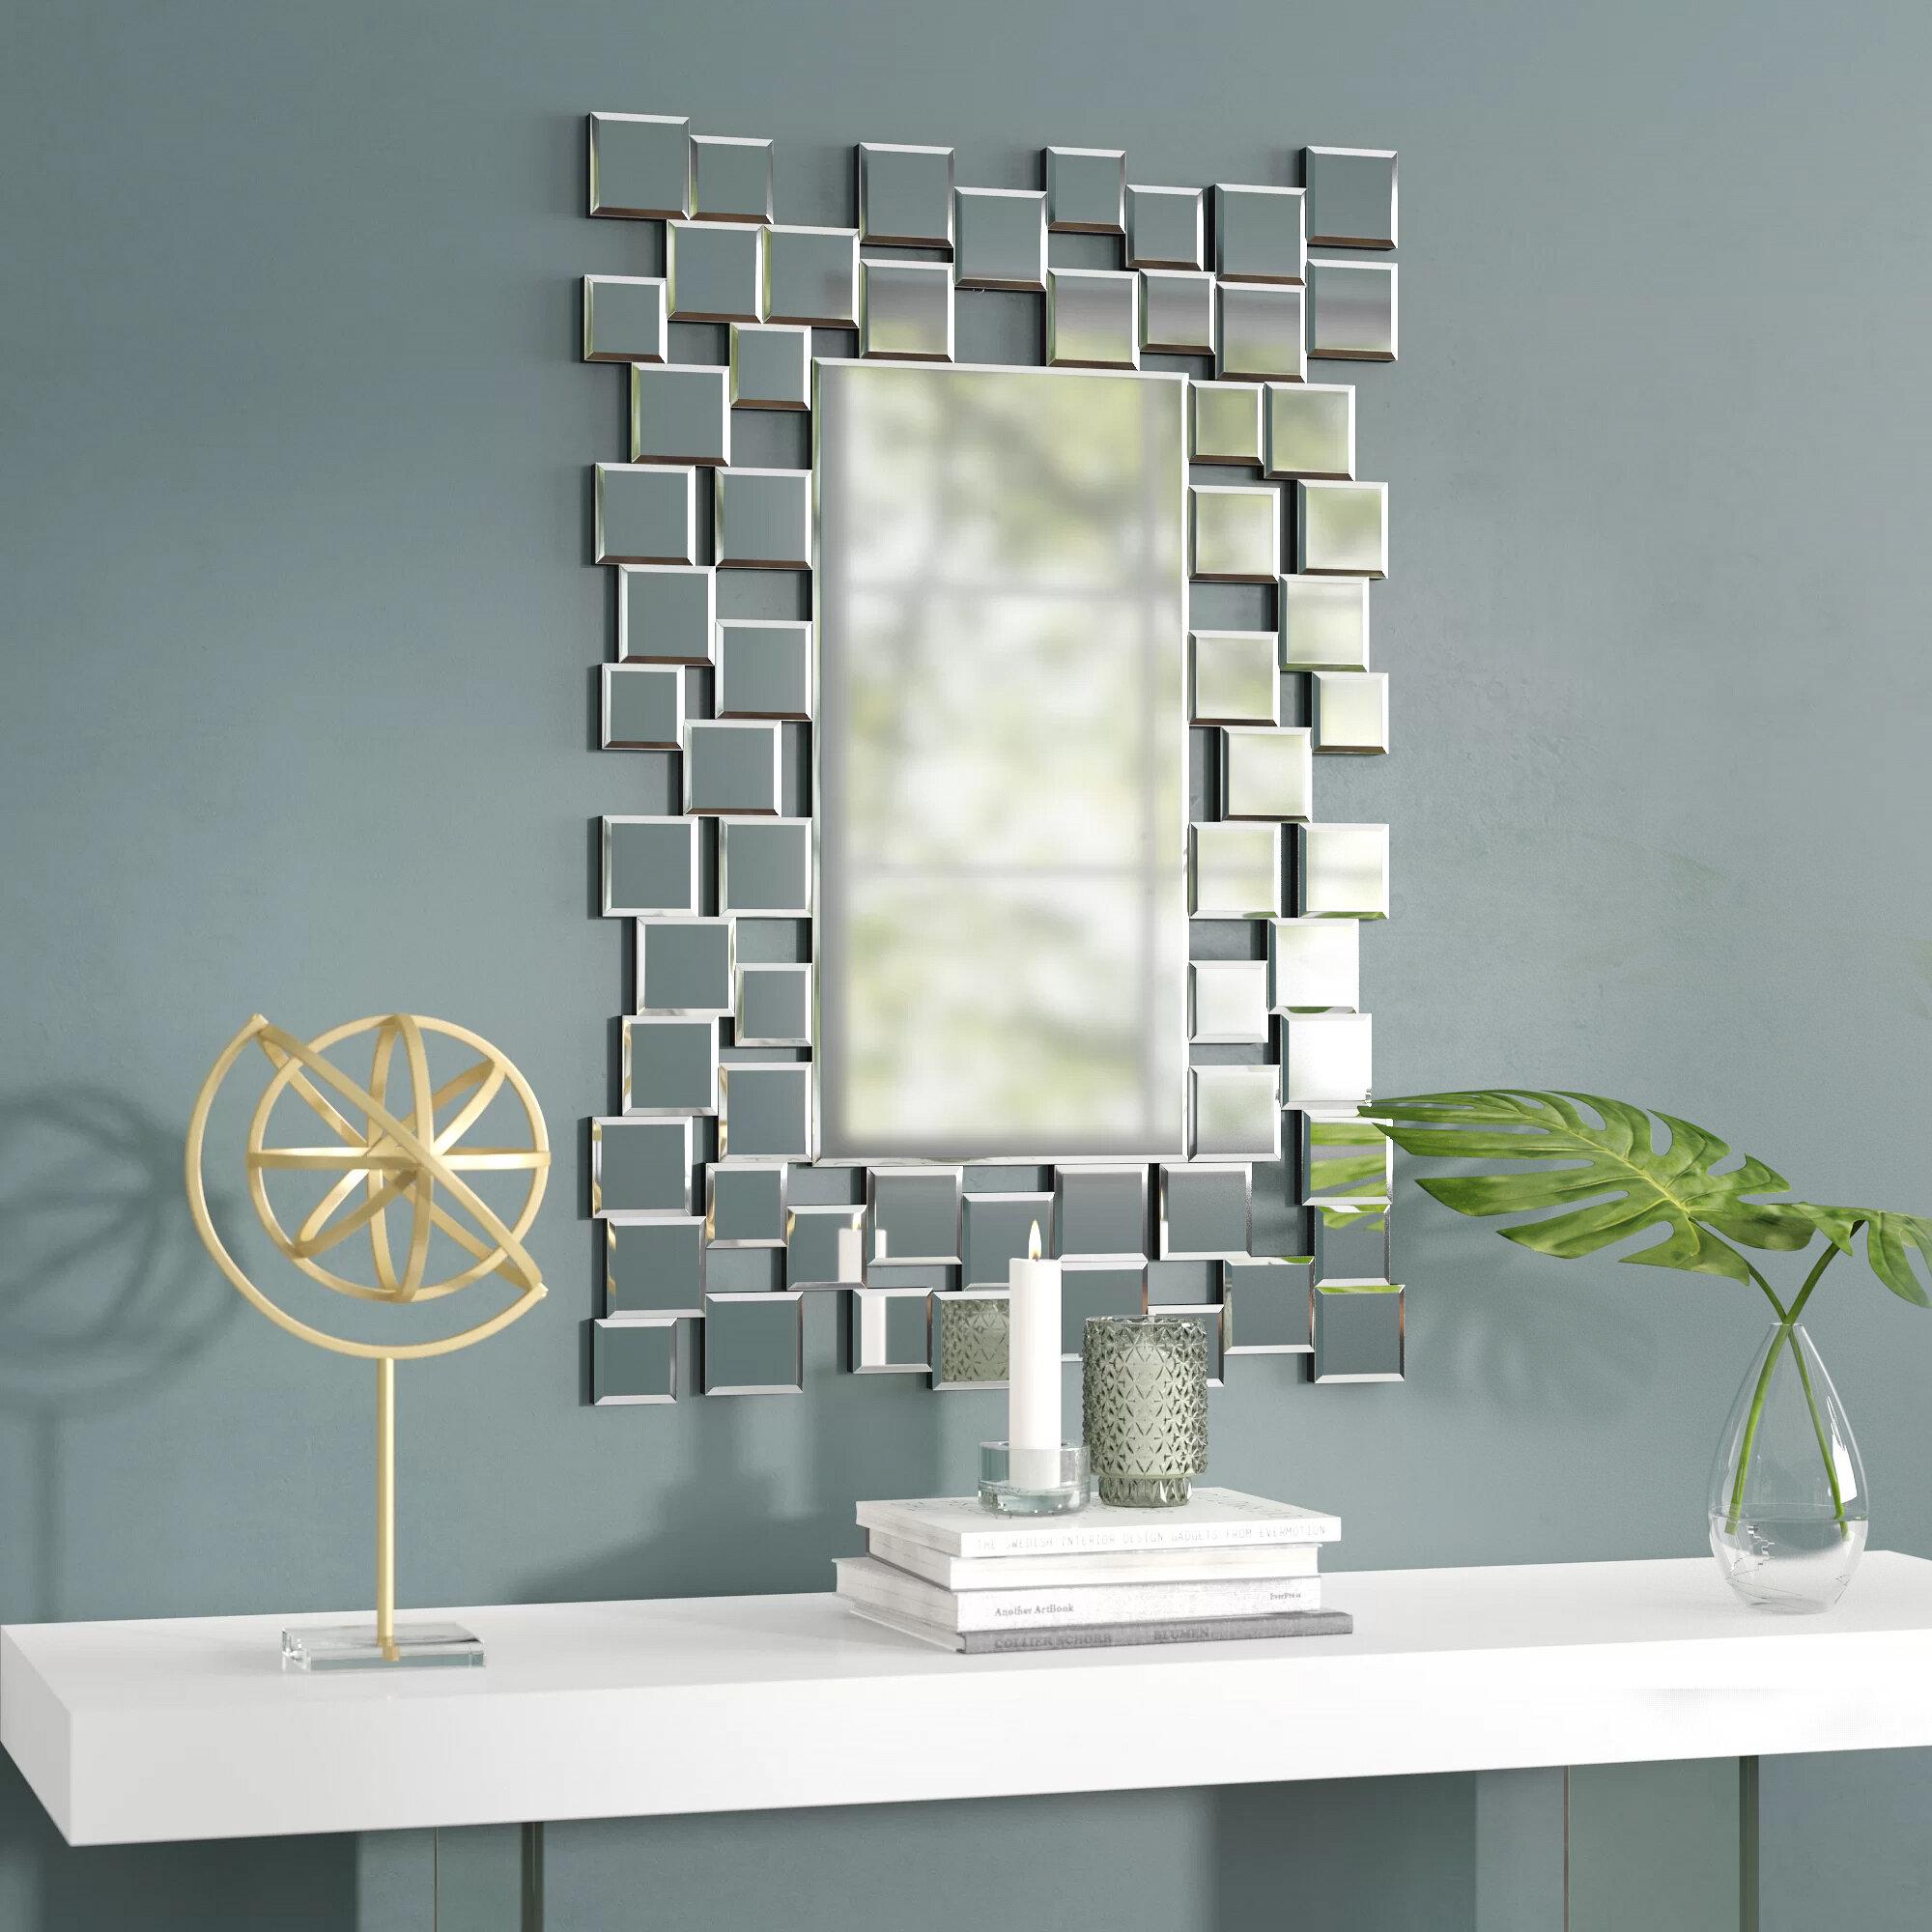 Brayden Studio Modern Contemporary Wall Mirror Reviews Wayfair